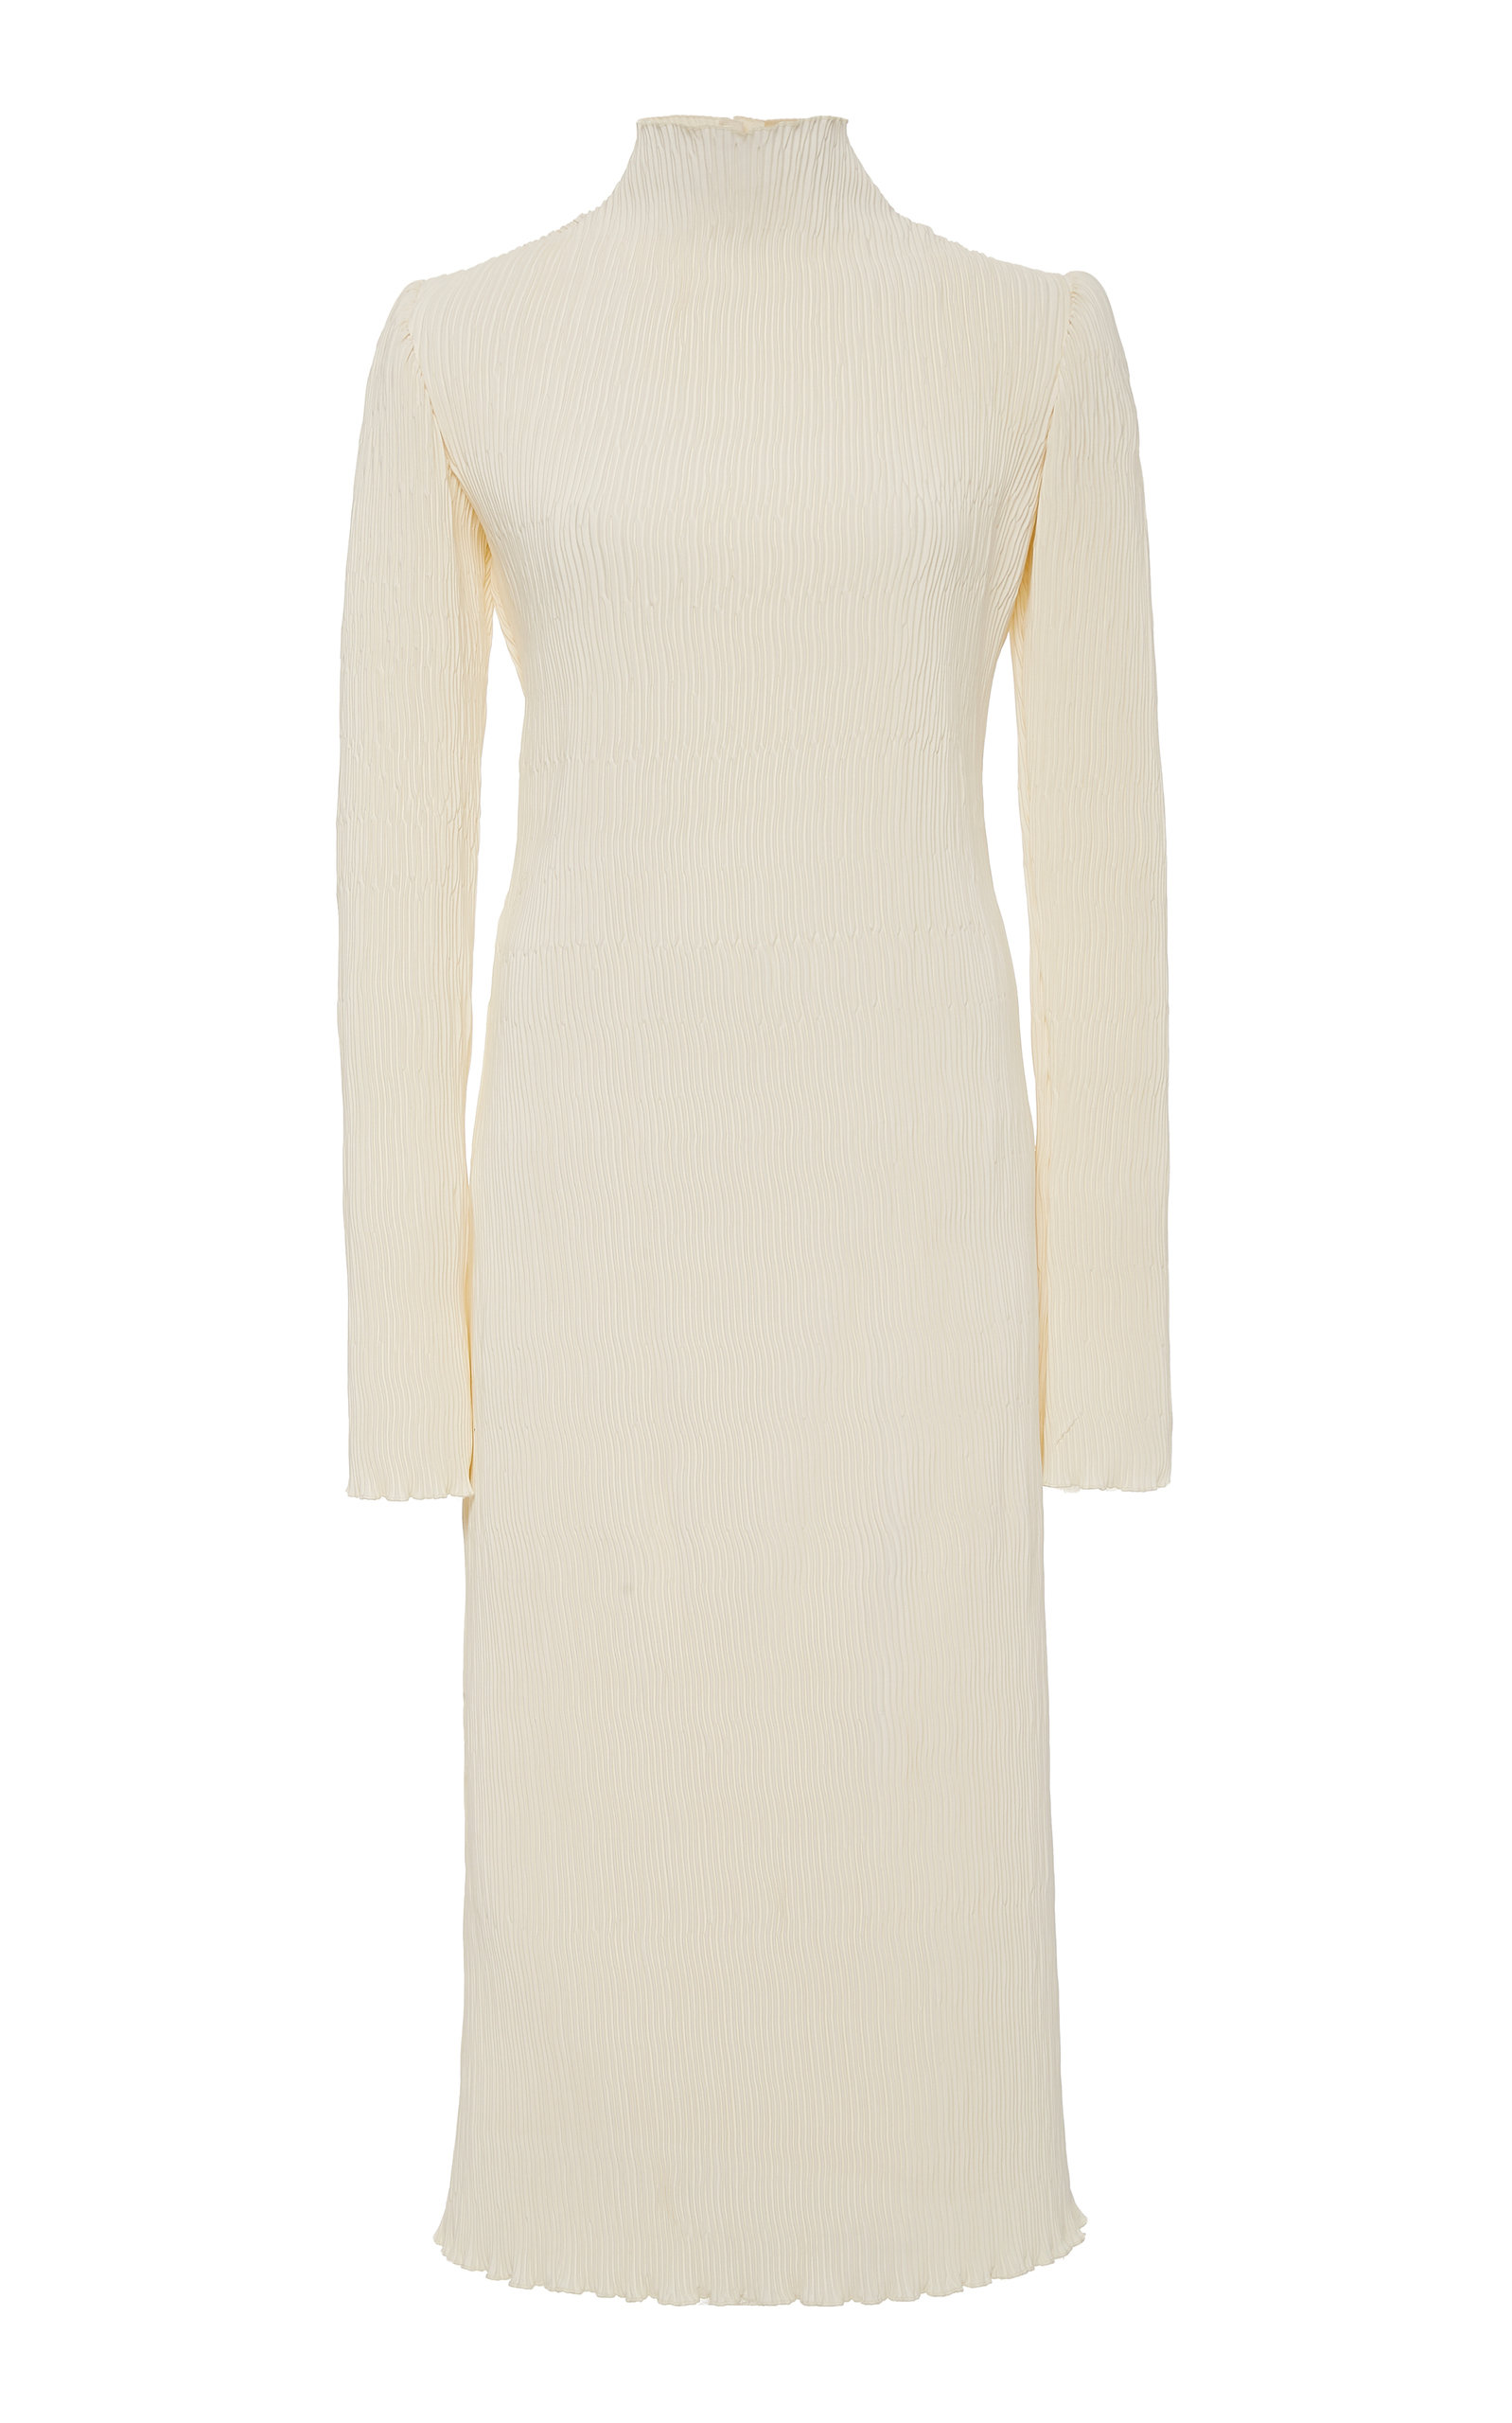 Buy Danielle Frankel Adrienne Pleated Silk and Wool Midi Dress online, shop Danielle Frankel at the best price